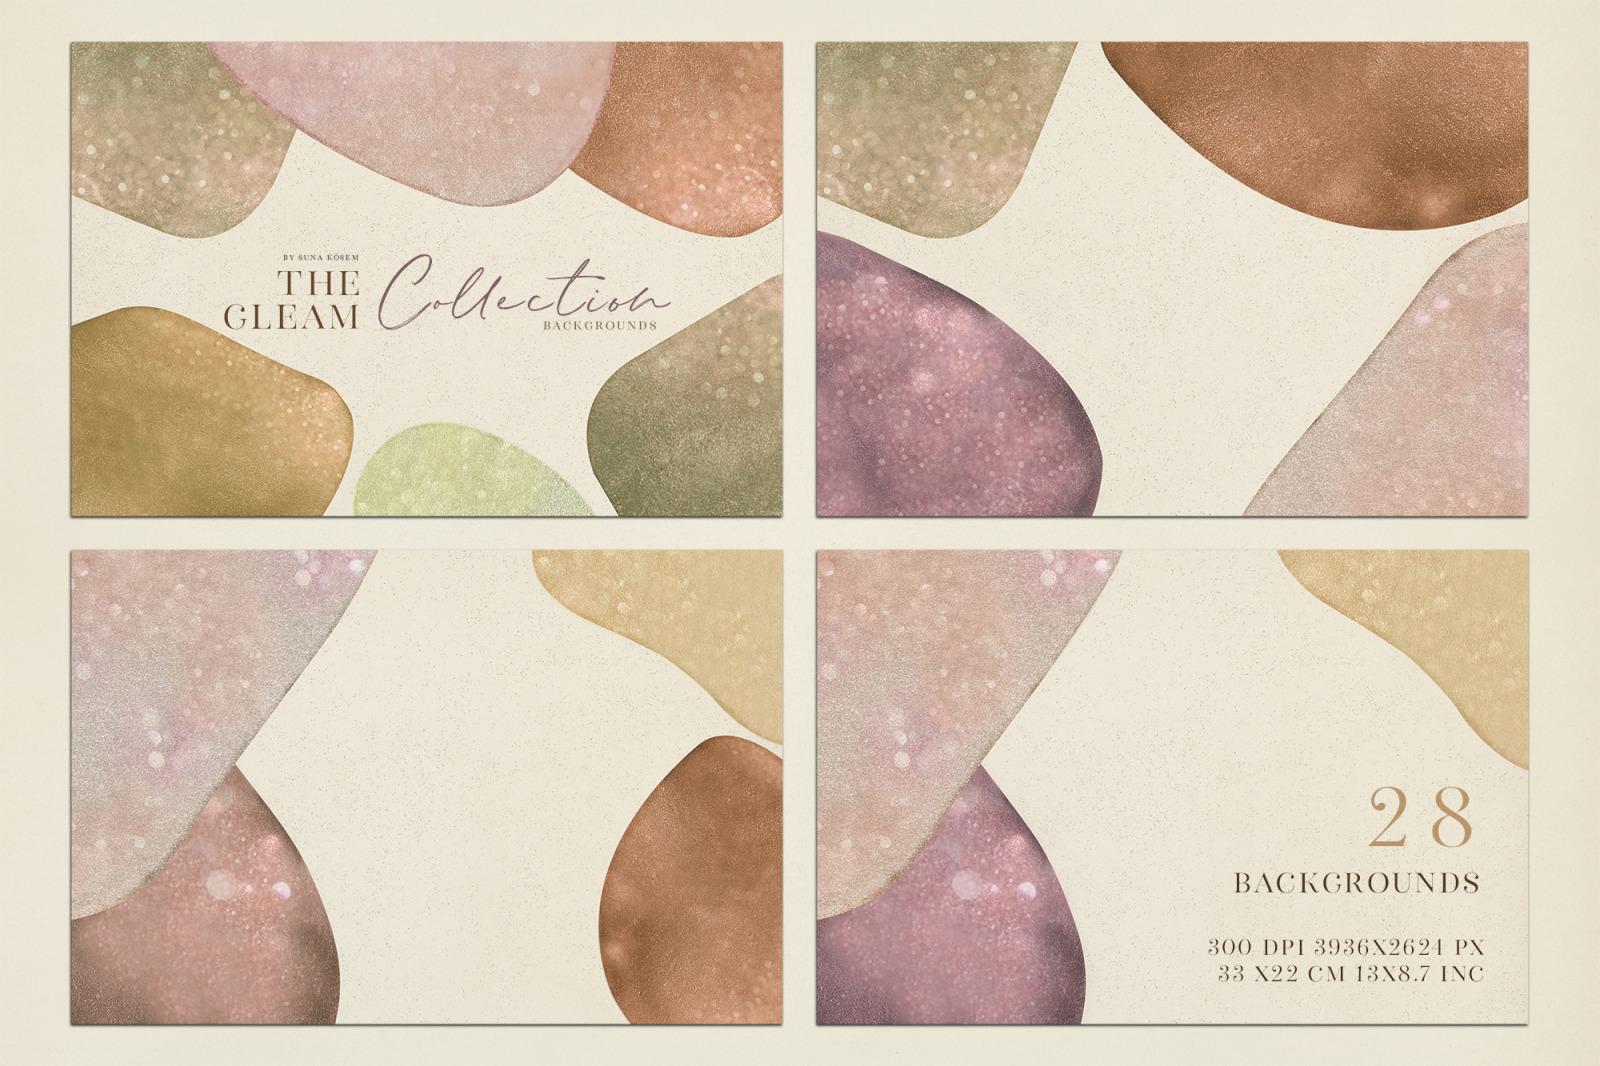 抽象闪闪发光水彩背景图片设计素材 The Gleam Watercolor Shapes插图4